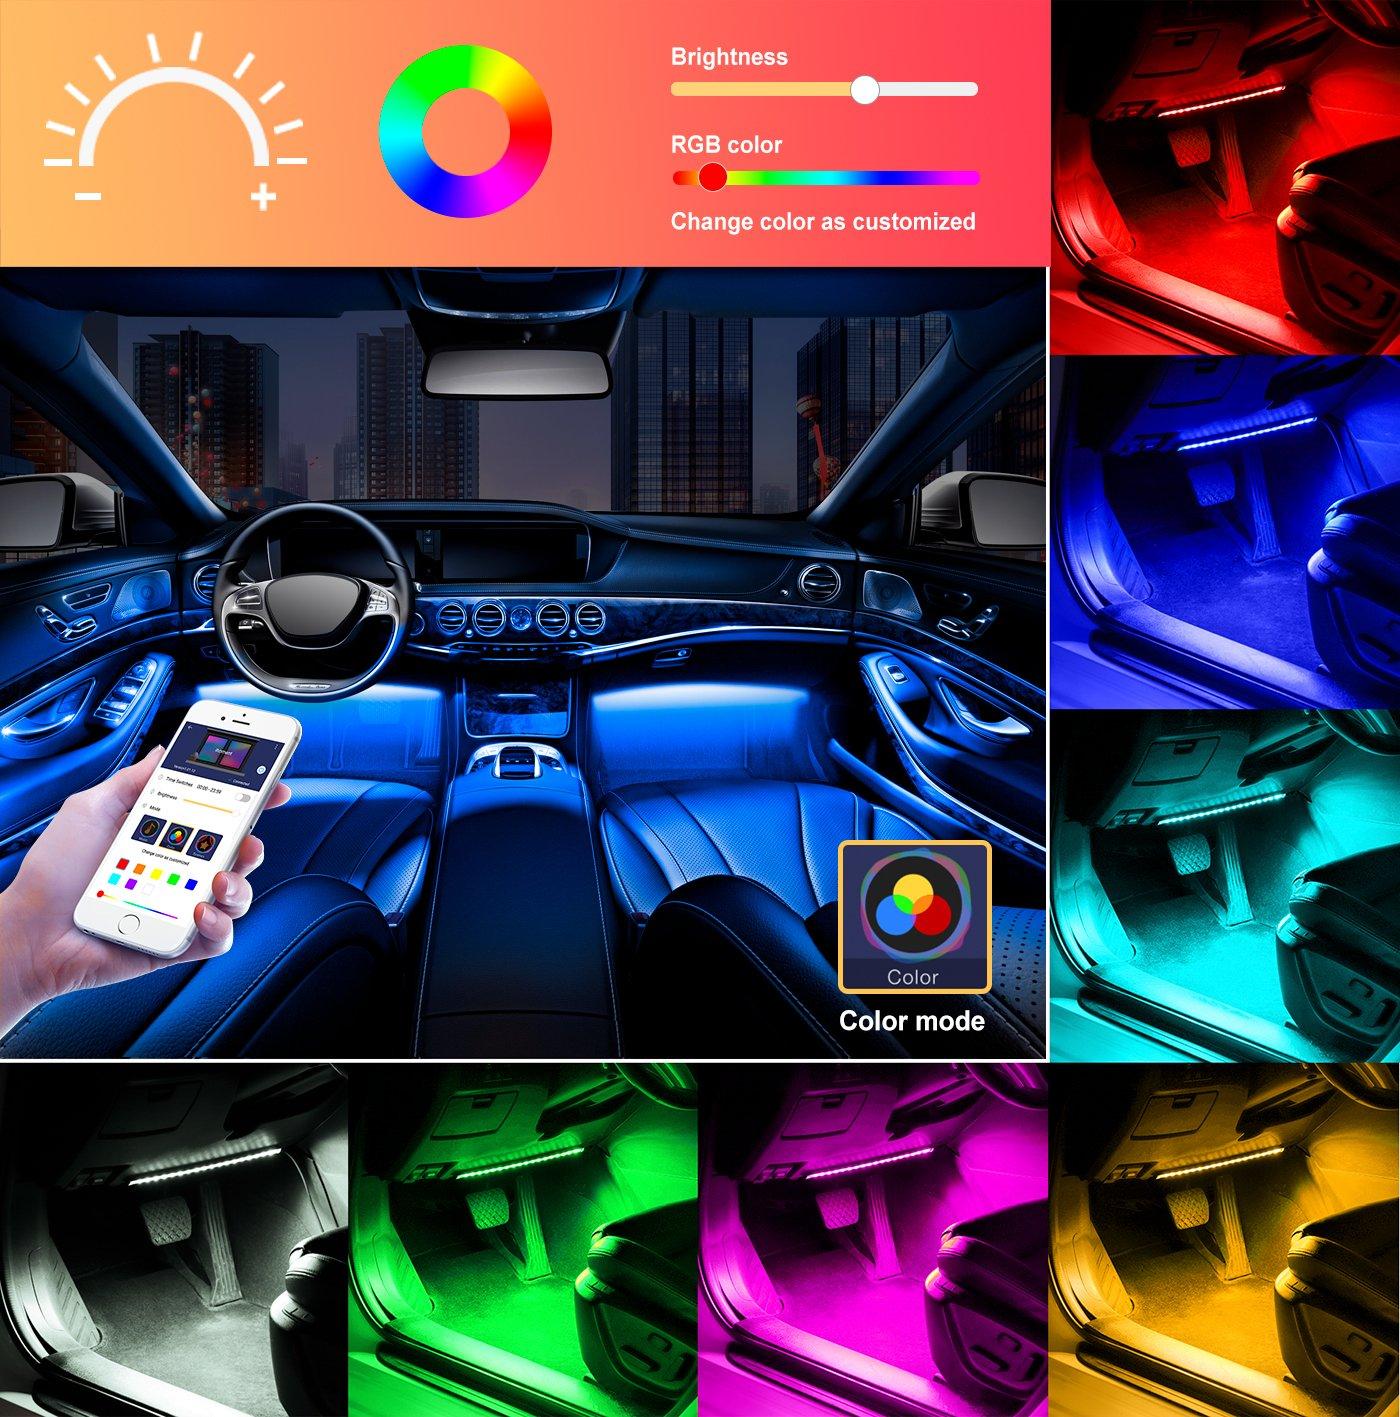 Unifilar Car LED Strip Light, Minger 4pcs 72 LED APP Controller Car Interior Lights, Waterproof Multicolor Music Under Dash Lighting Kits for iPhone Android Smart Phone, Car Charger Included, DC 12V by MINGER (Image #4)